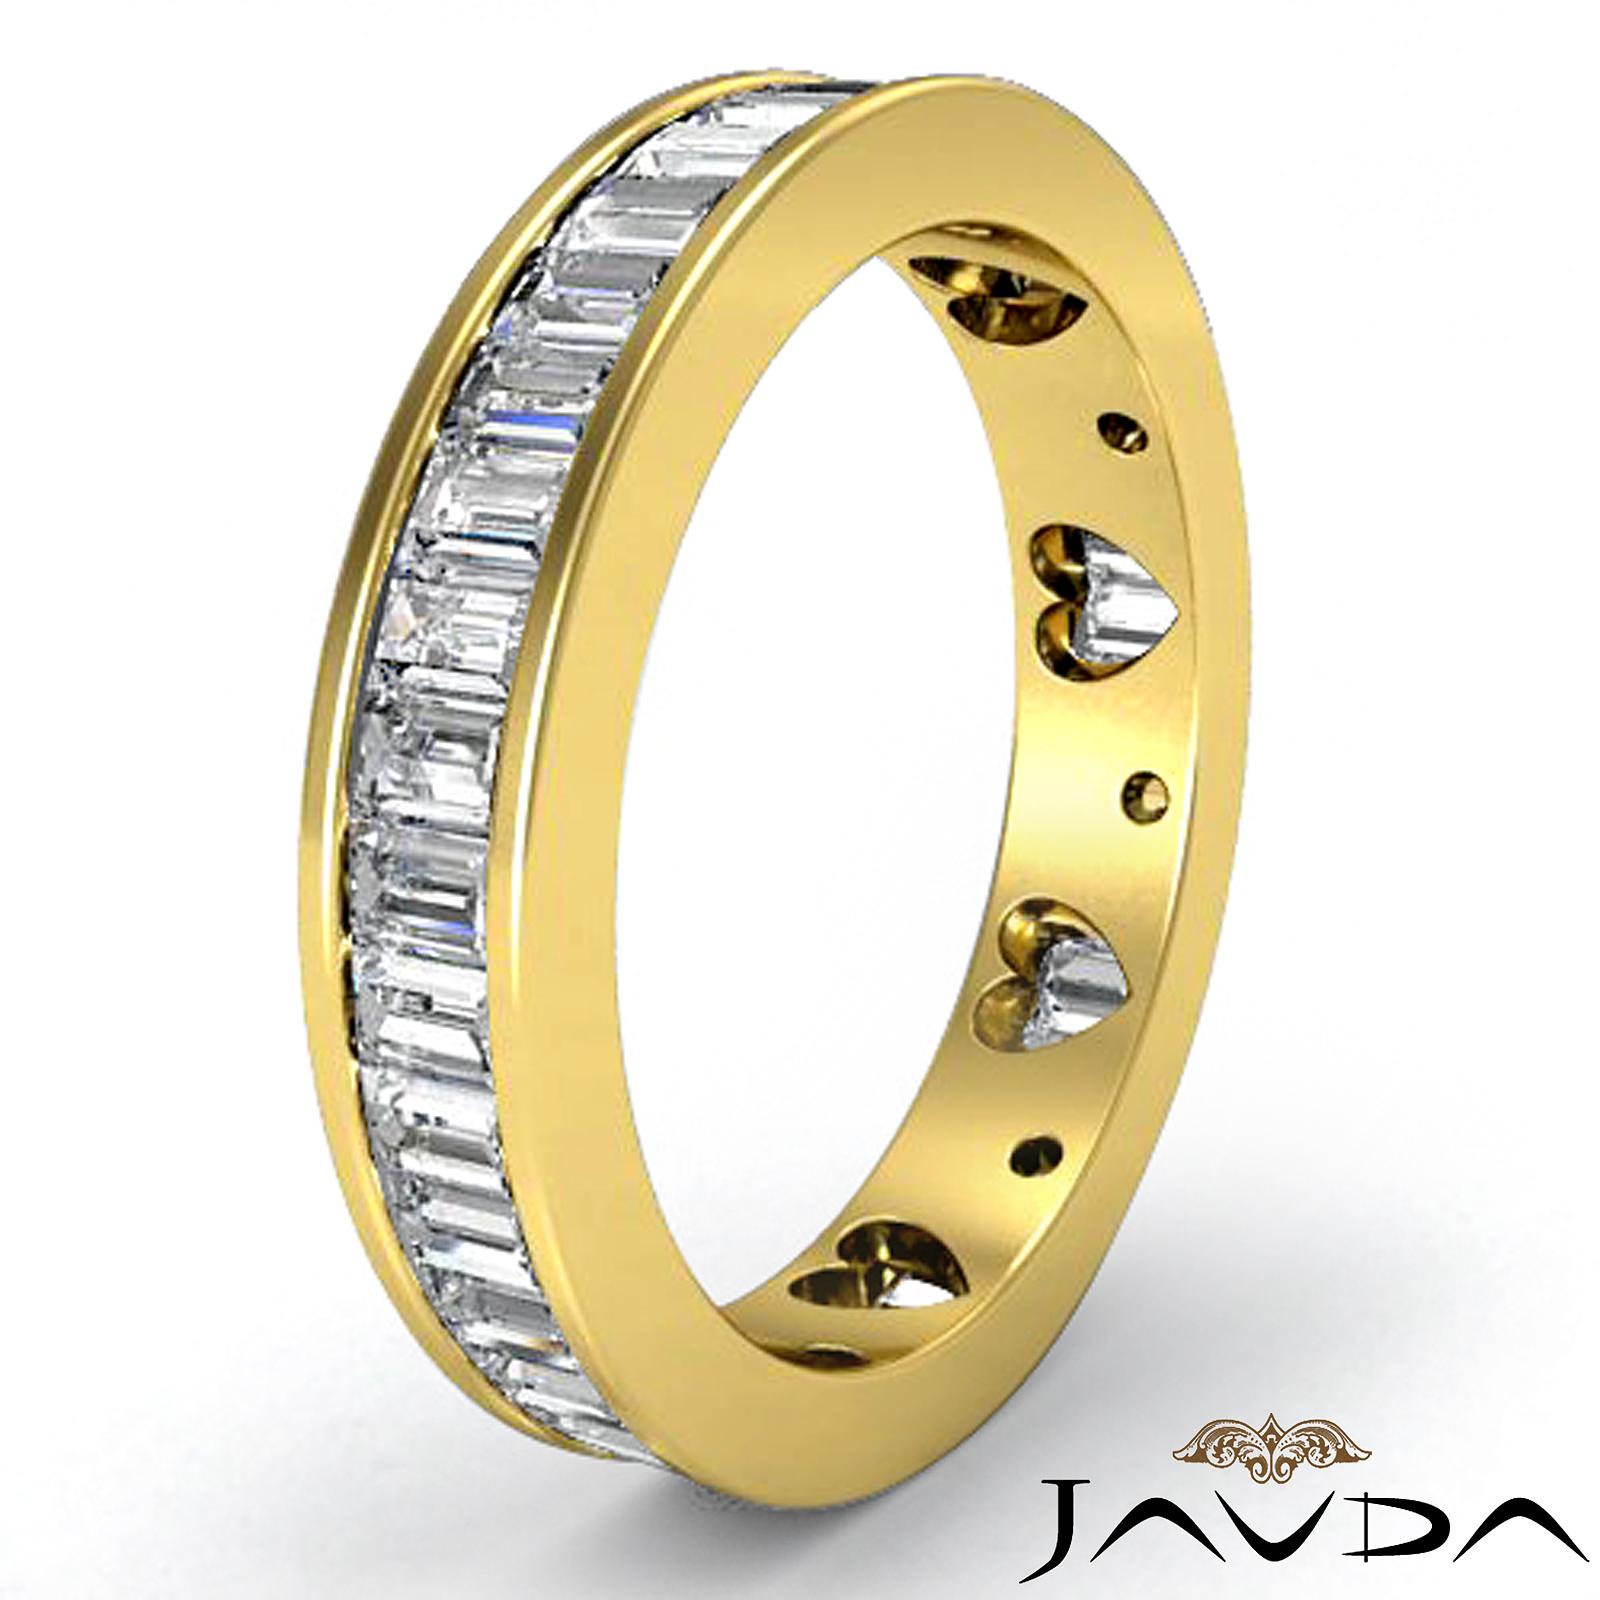 baguette diamond women 39 s wedding ring heart eternity band. Black Bedroom Furniture Sets. Home Design Ideas